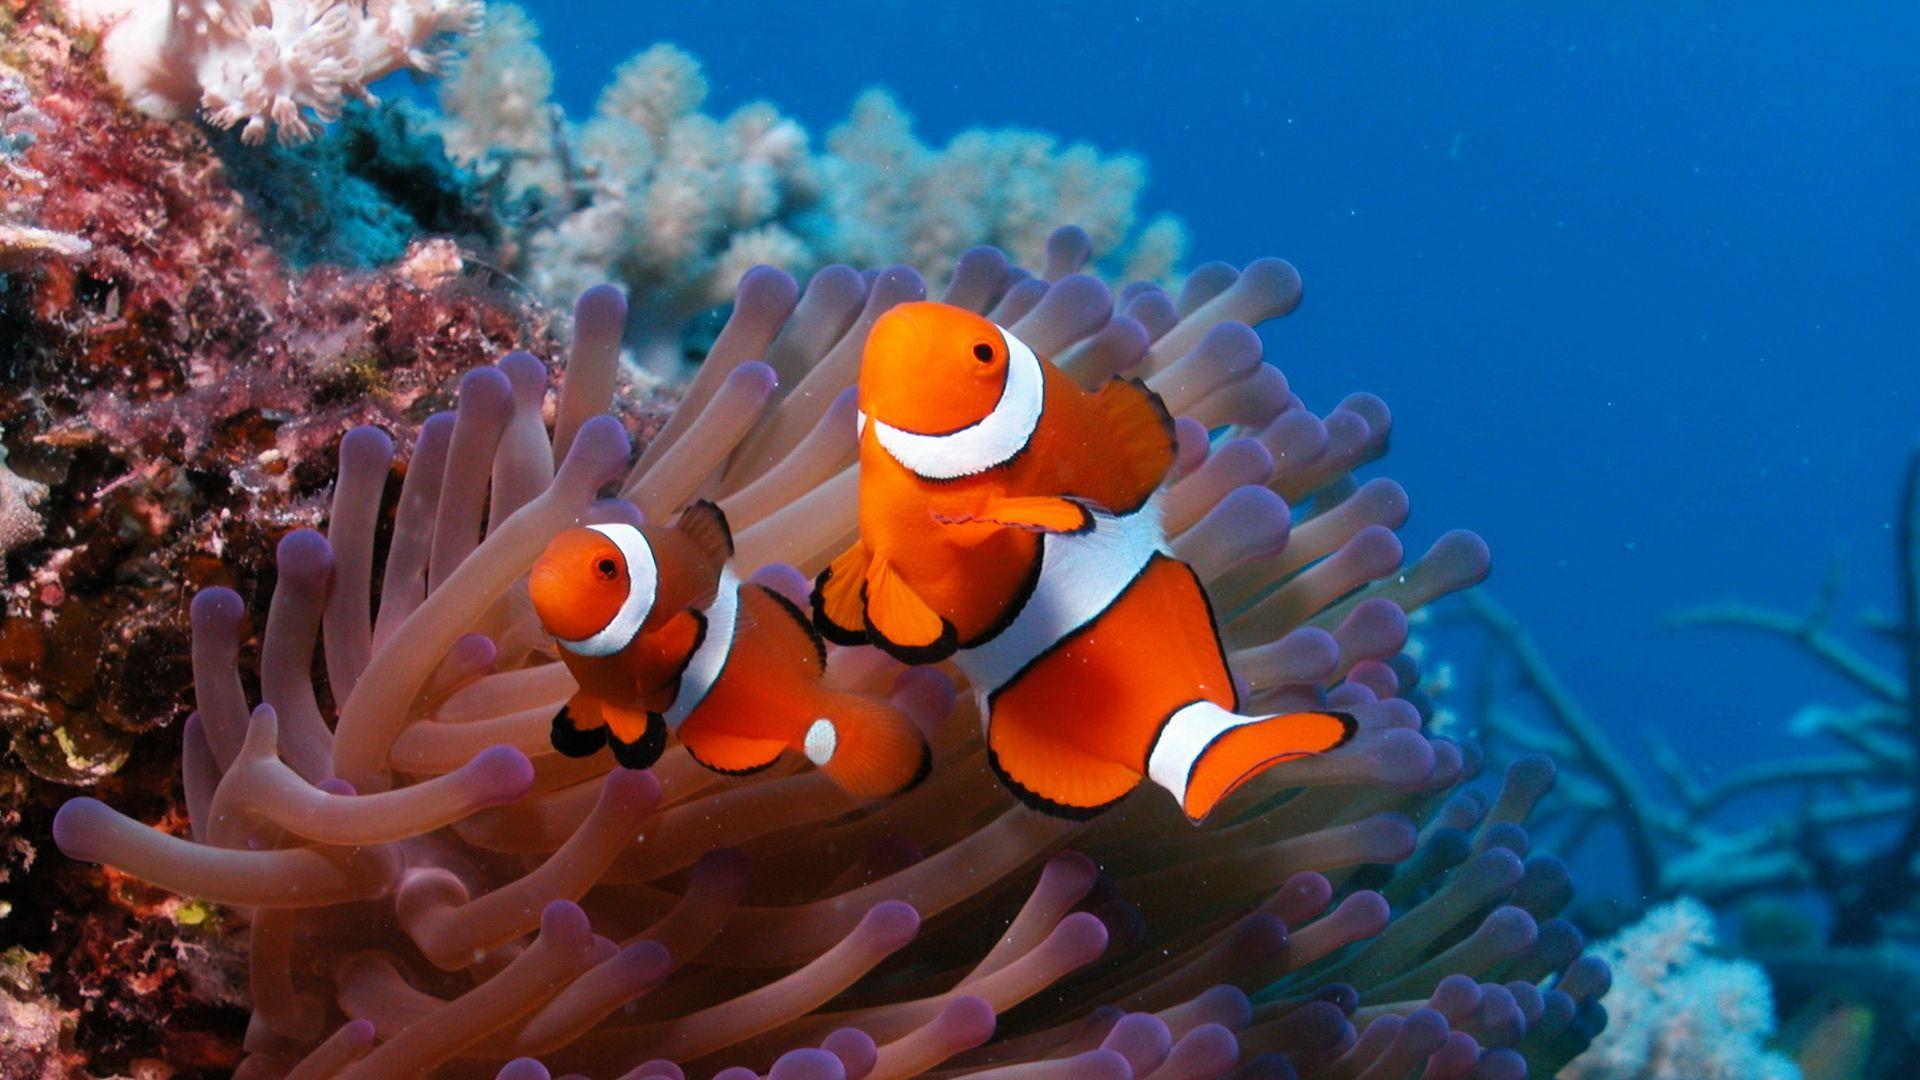 Underwater World HD Wallpapers 1600×1200 Wallpapers Underwater (36 Wallpapers) | Adorable ...